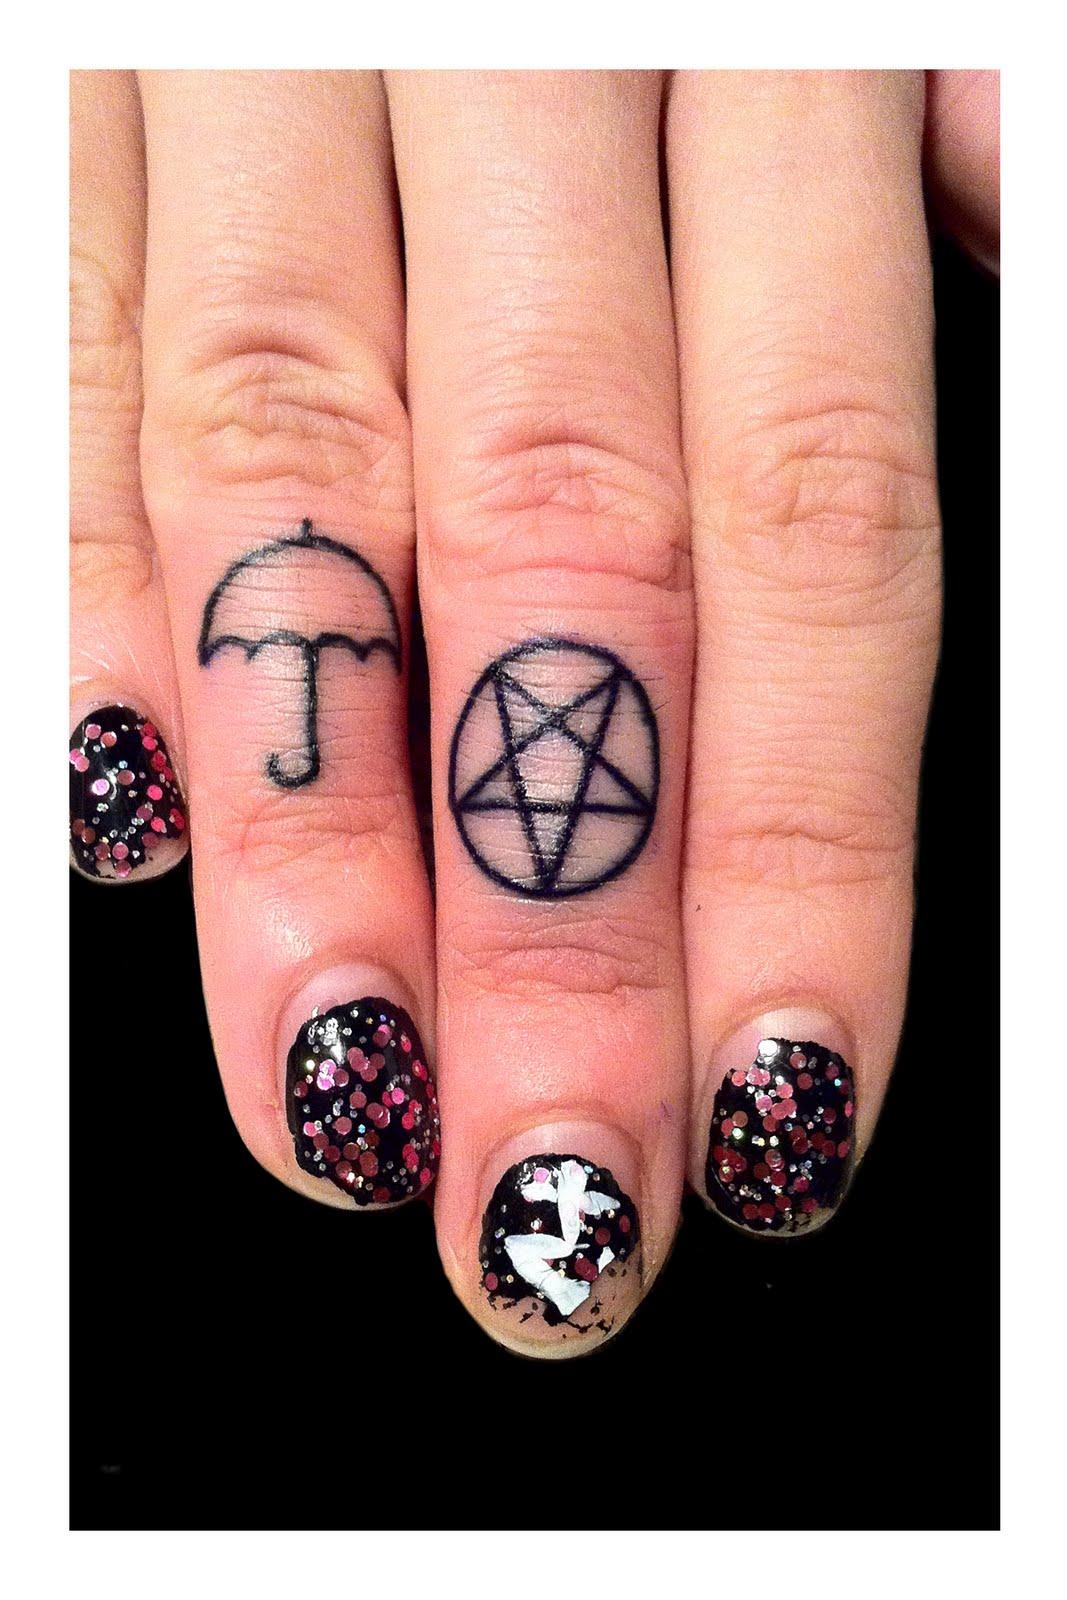 http://4.bp.blogspot.com/_9Ch0UgdfCgs/TQcRS_rrV5I/AAAAAAAAB7A/kIwgUndfVp0/s1600/Kelco_Finger_Tattoo_02.jpg